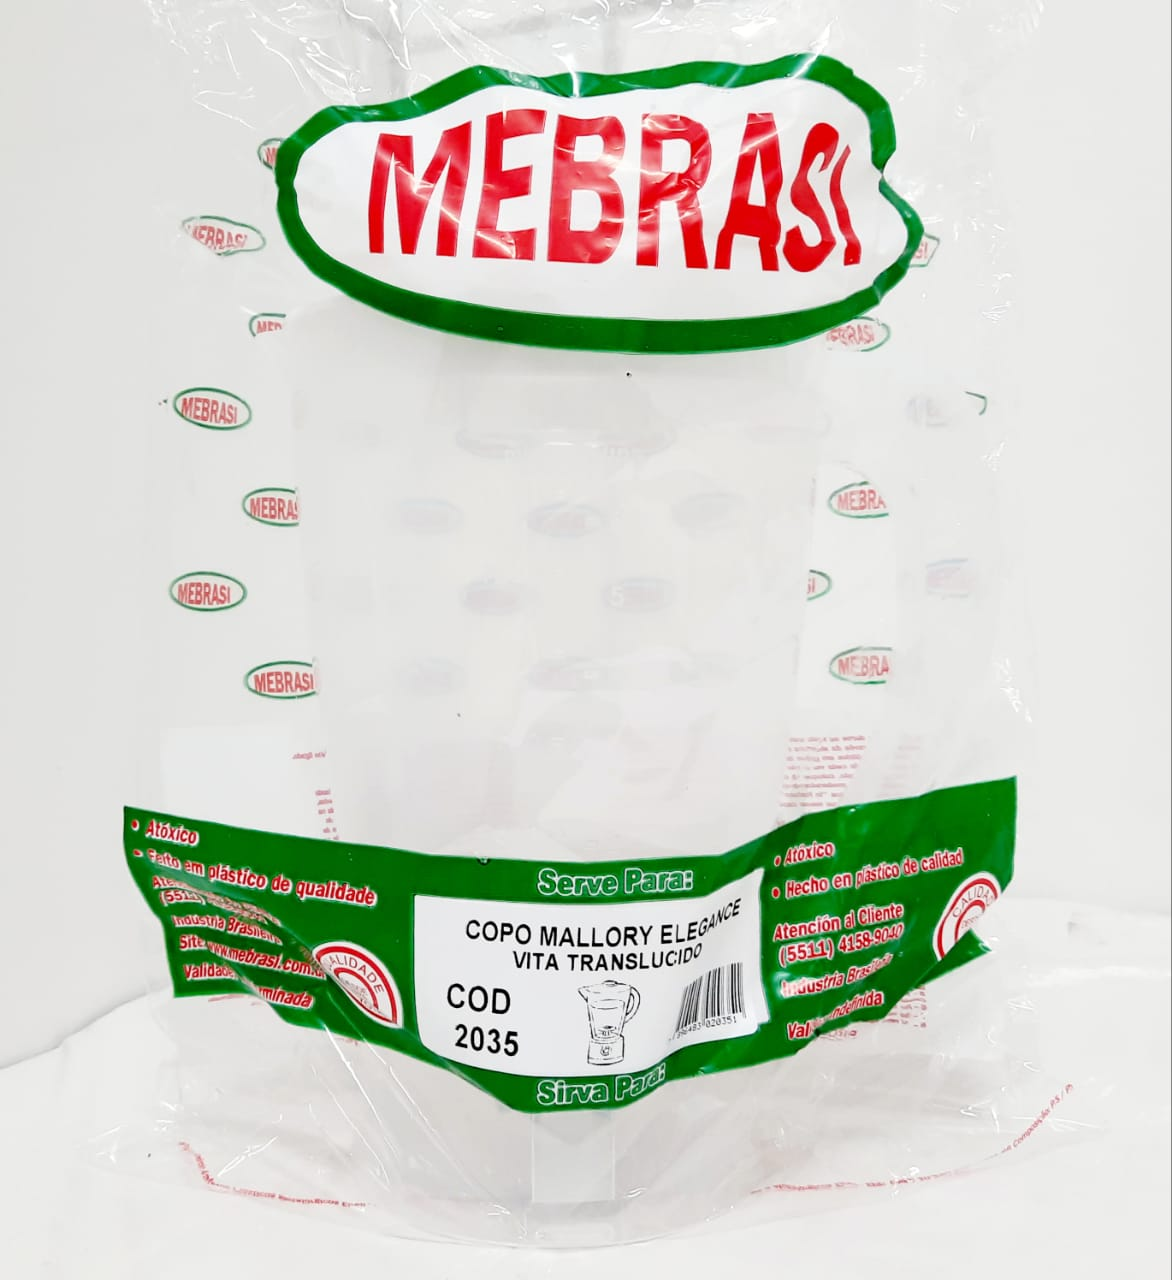 Copo MALL TRAN ELEG - Mebrasi